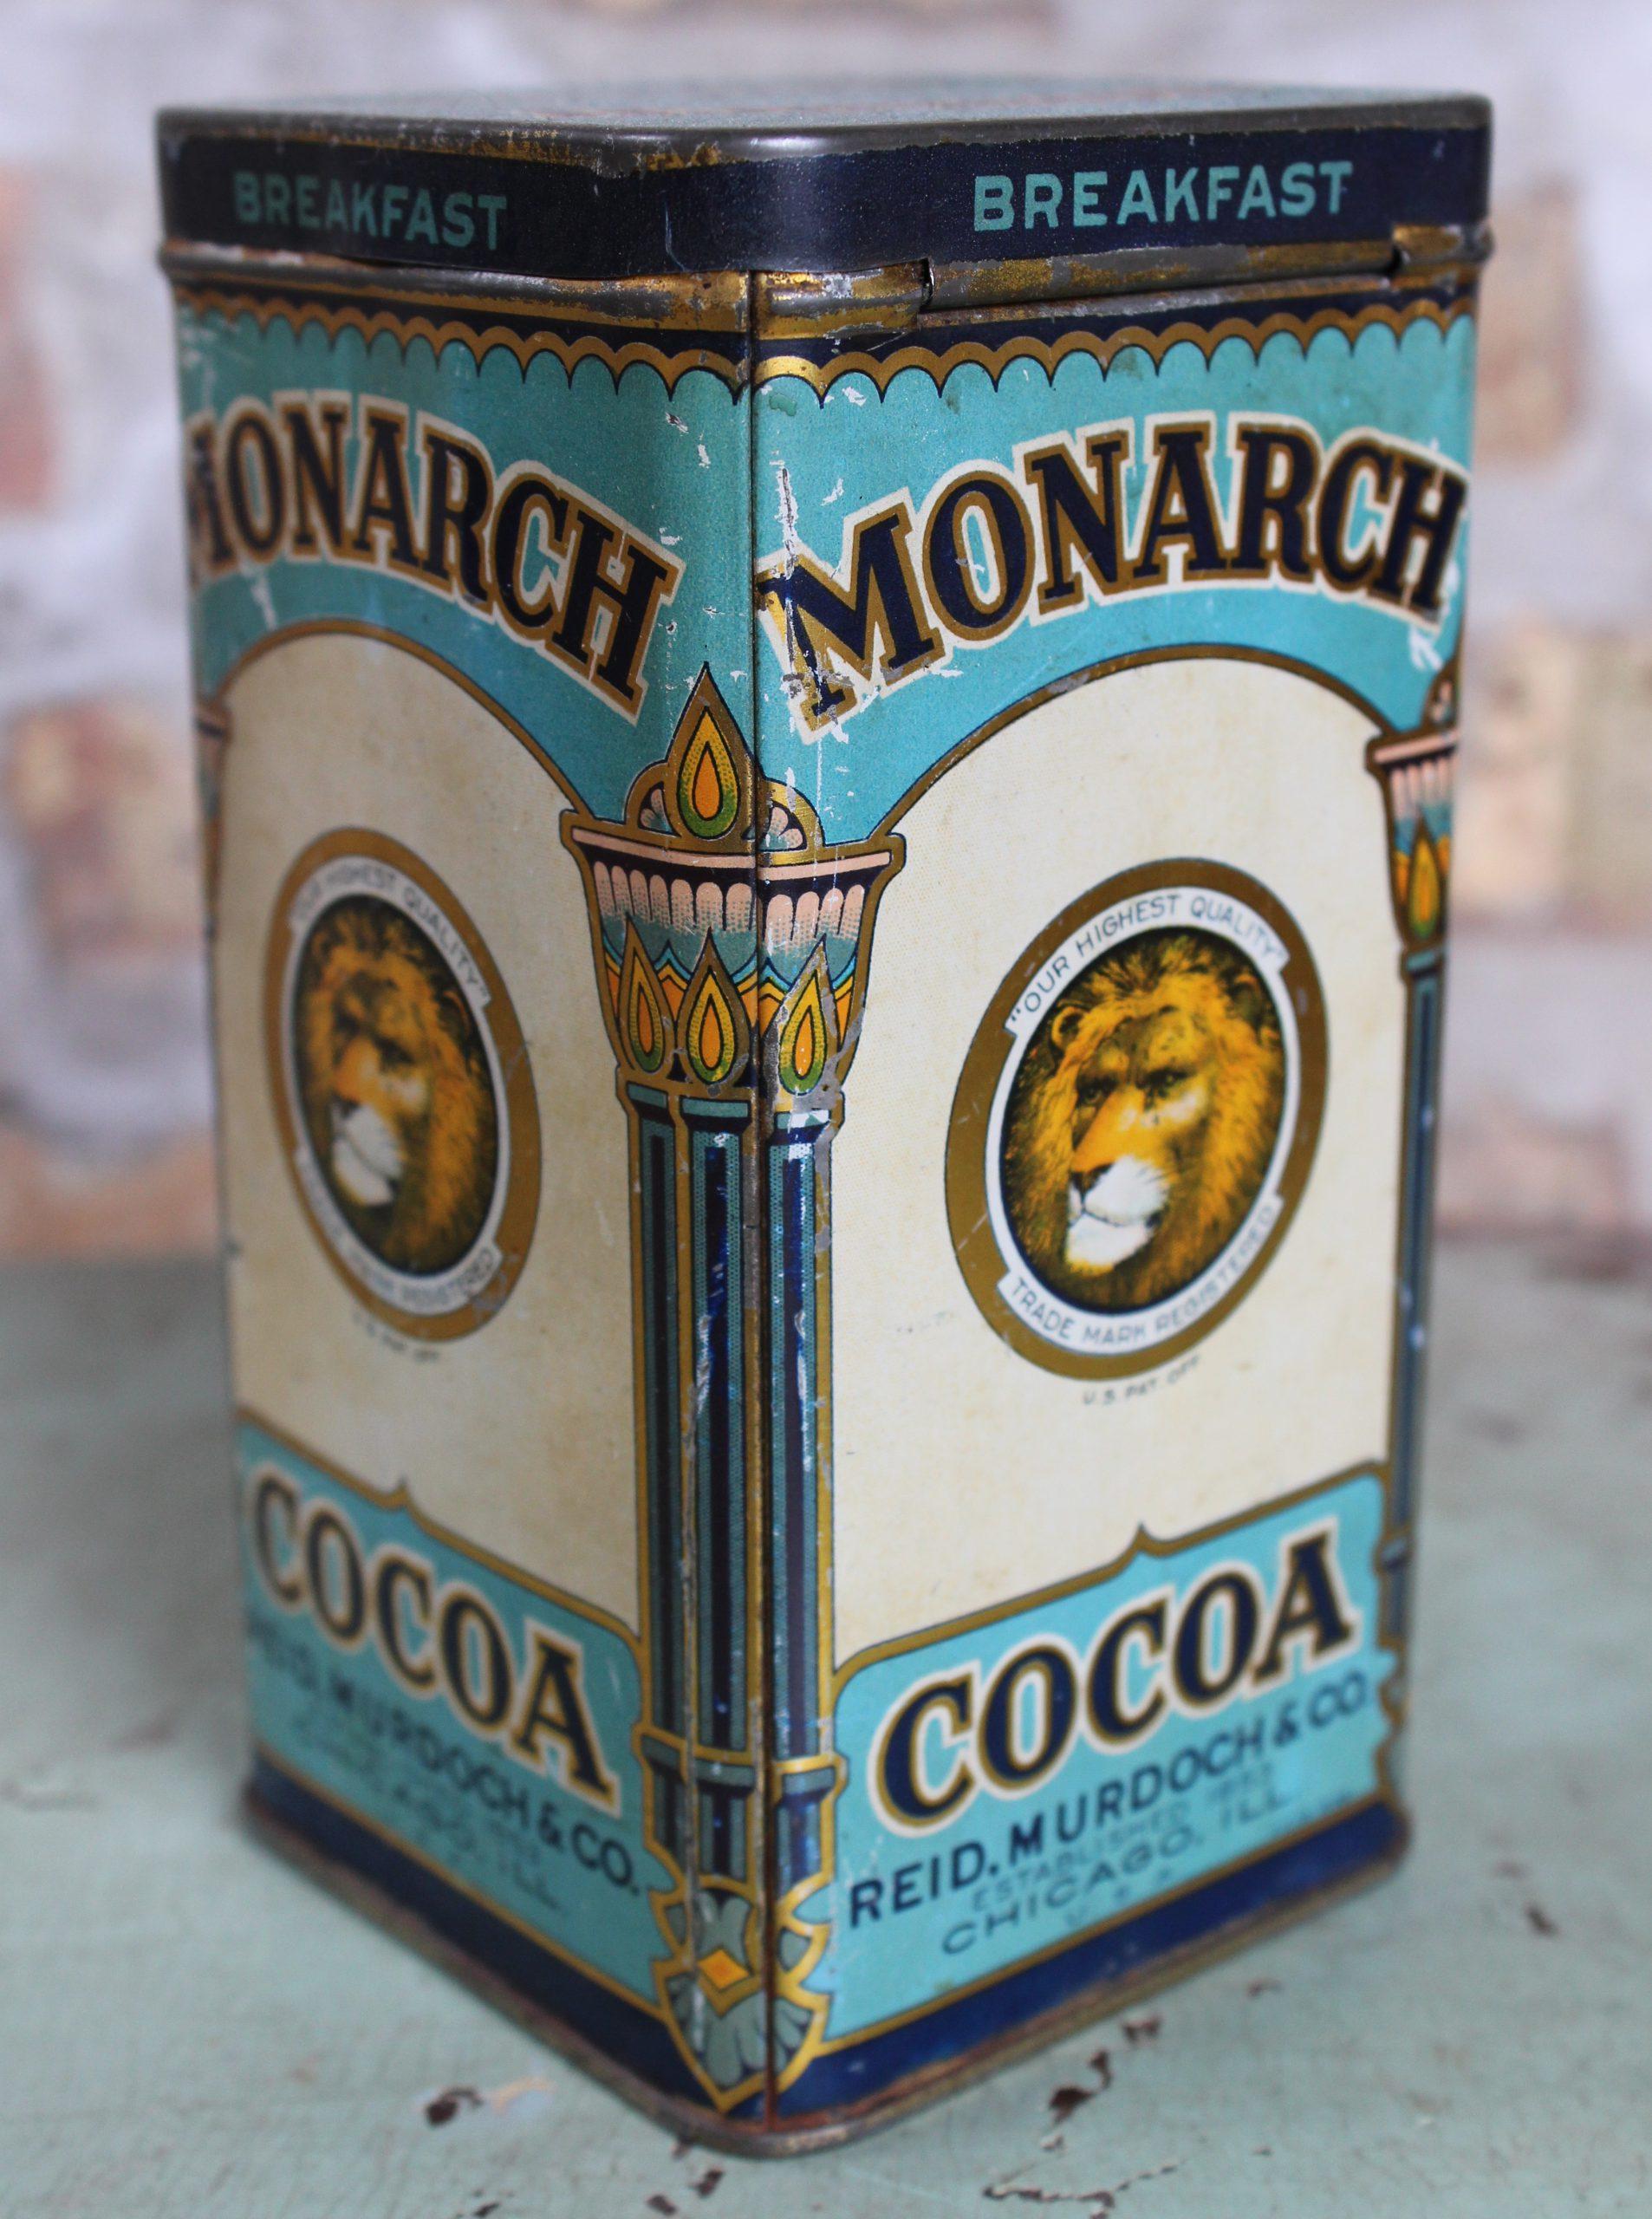 Reid Murdoch Monarch History